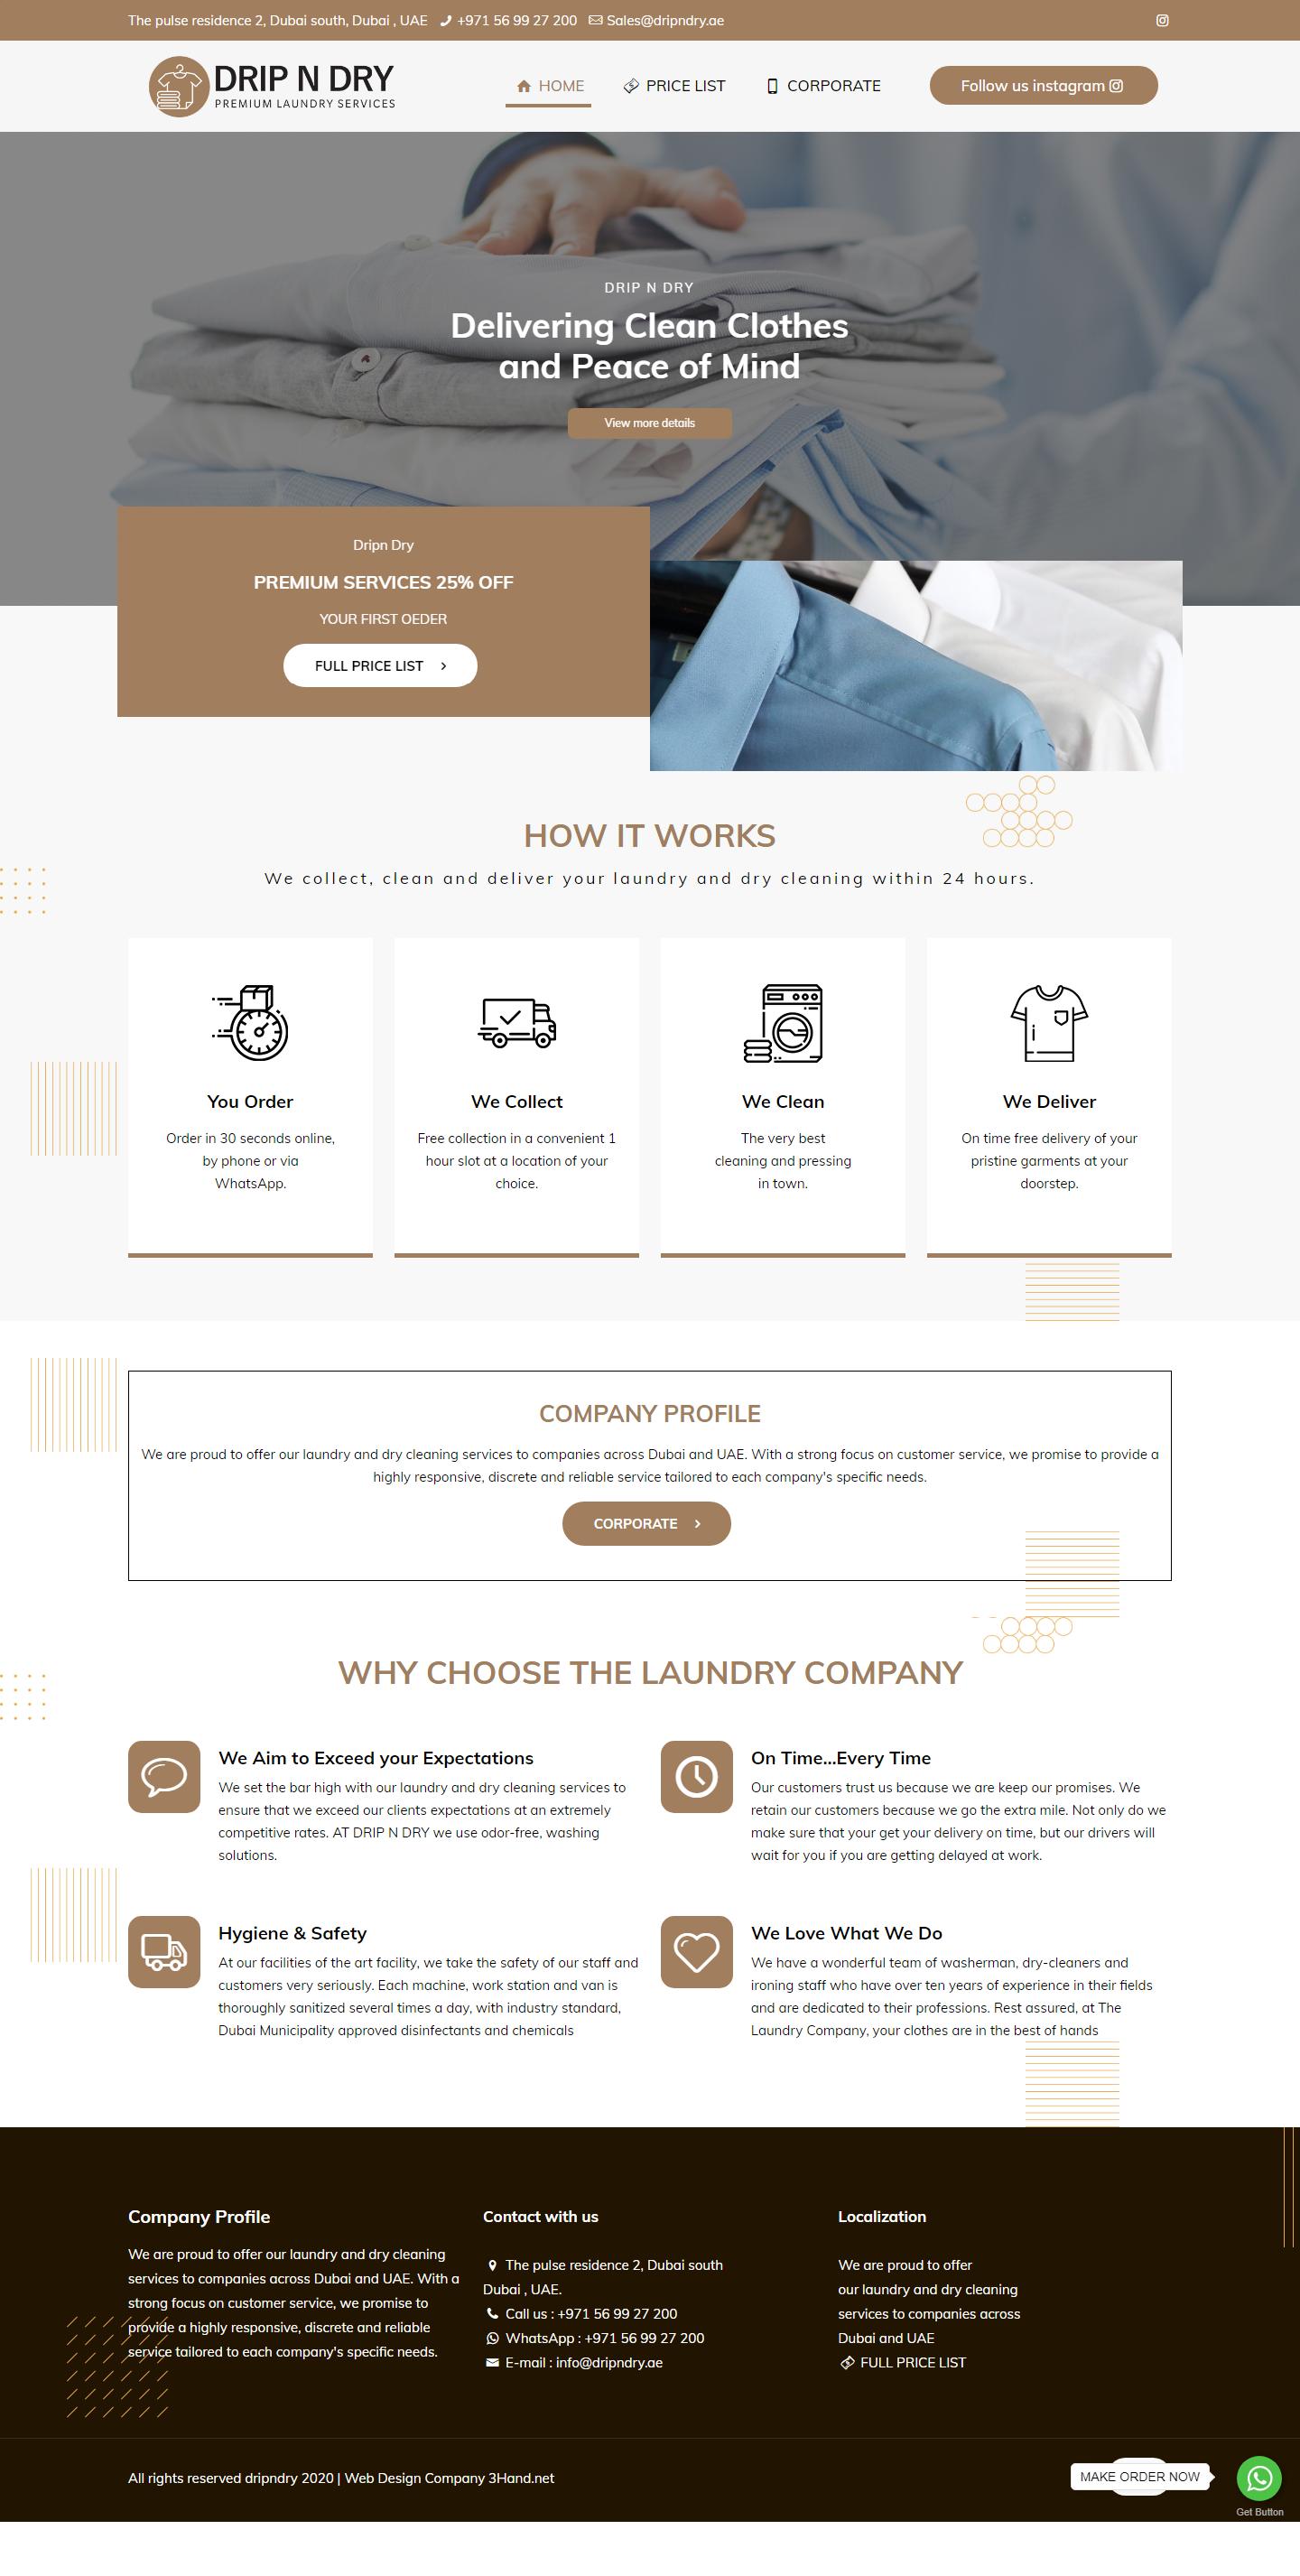 DRIP-N-DRY-–-Premium-laundry-services